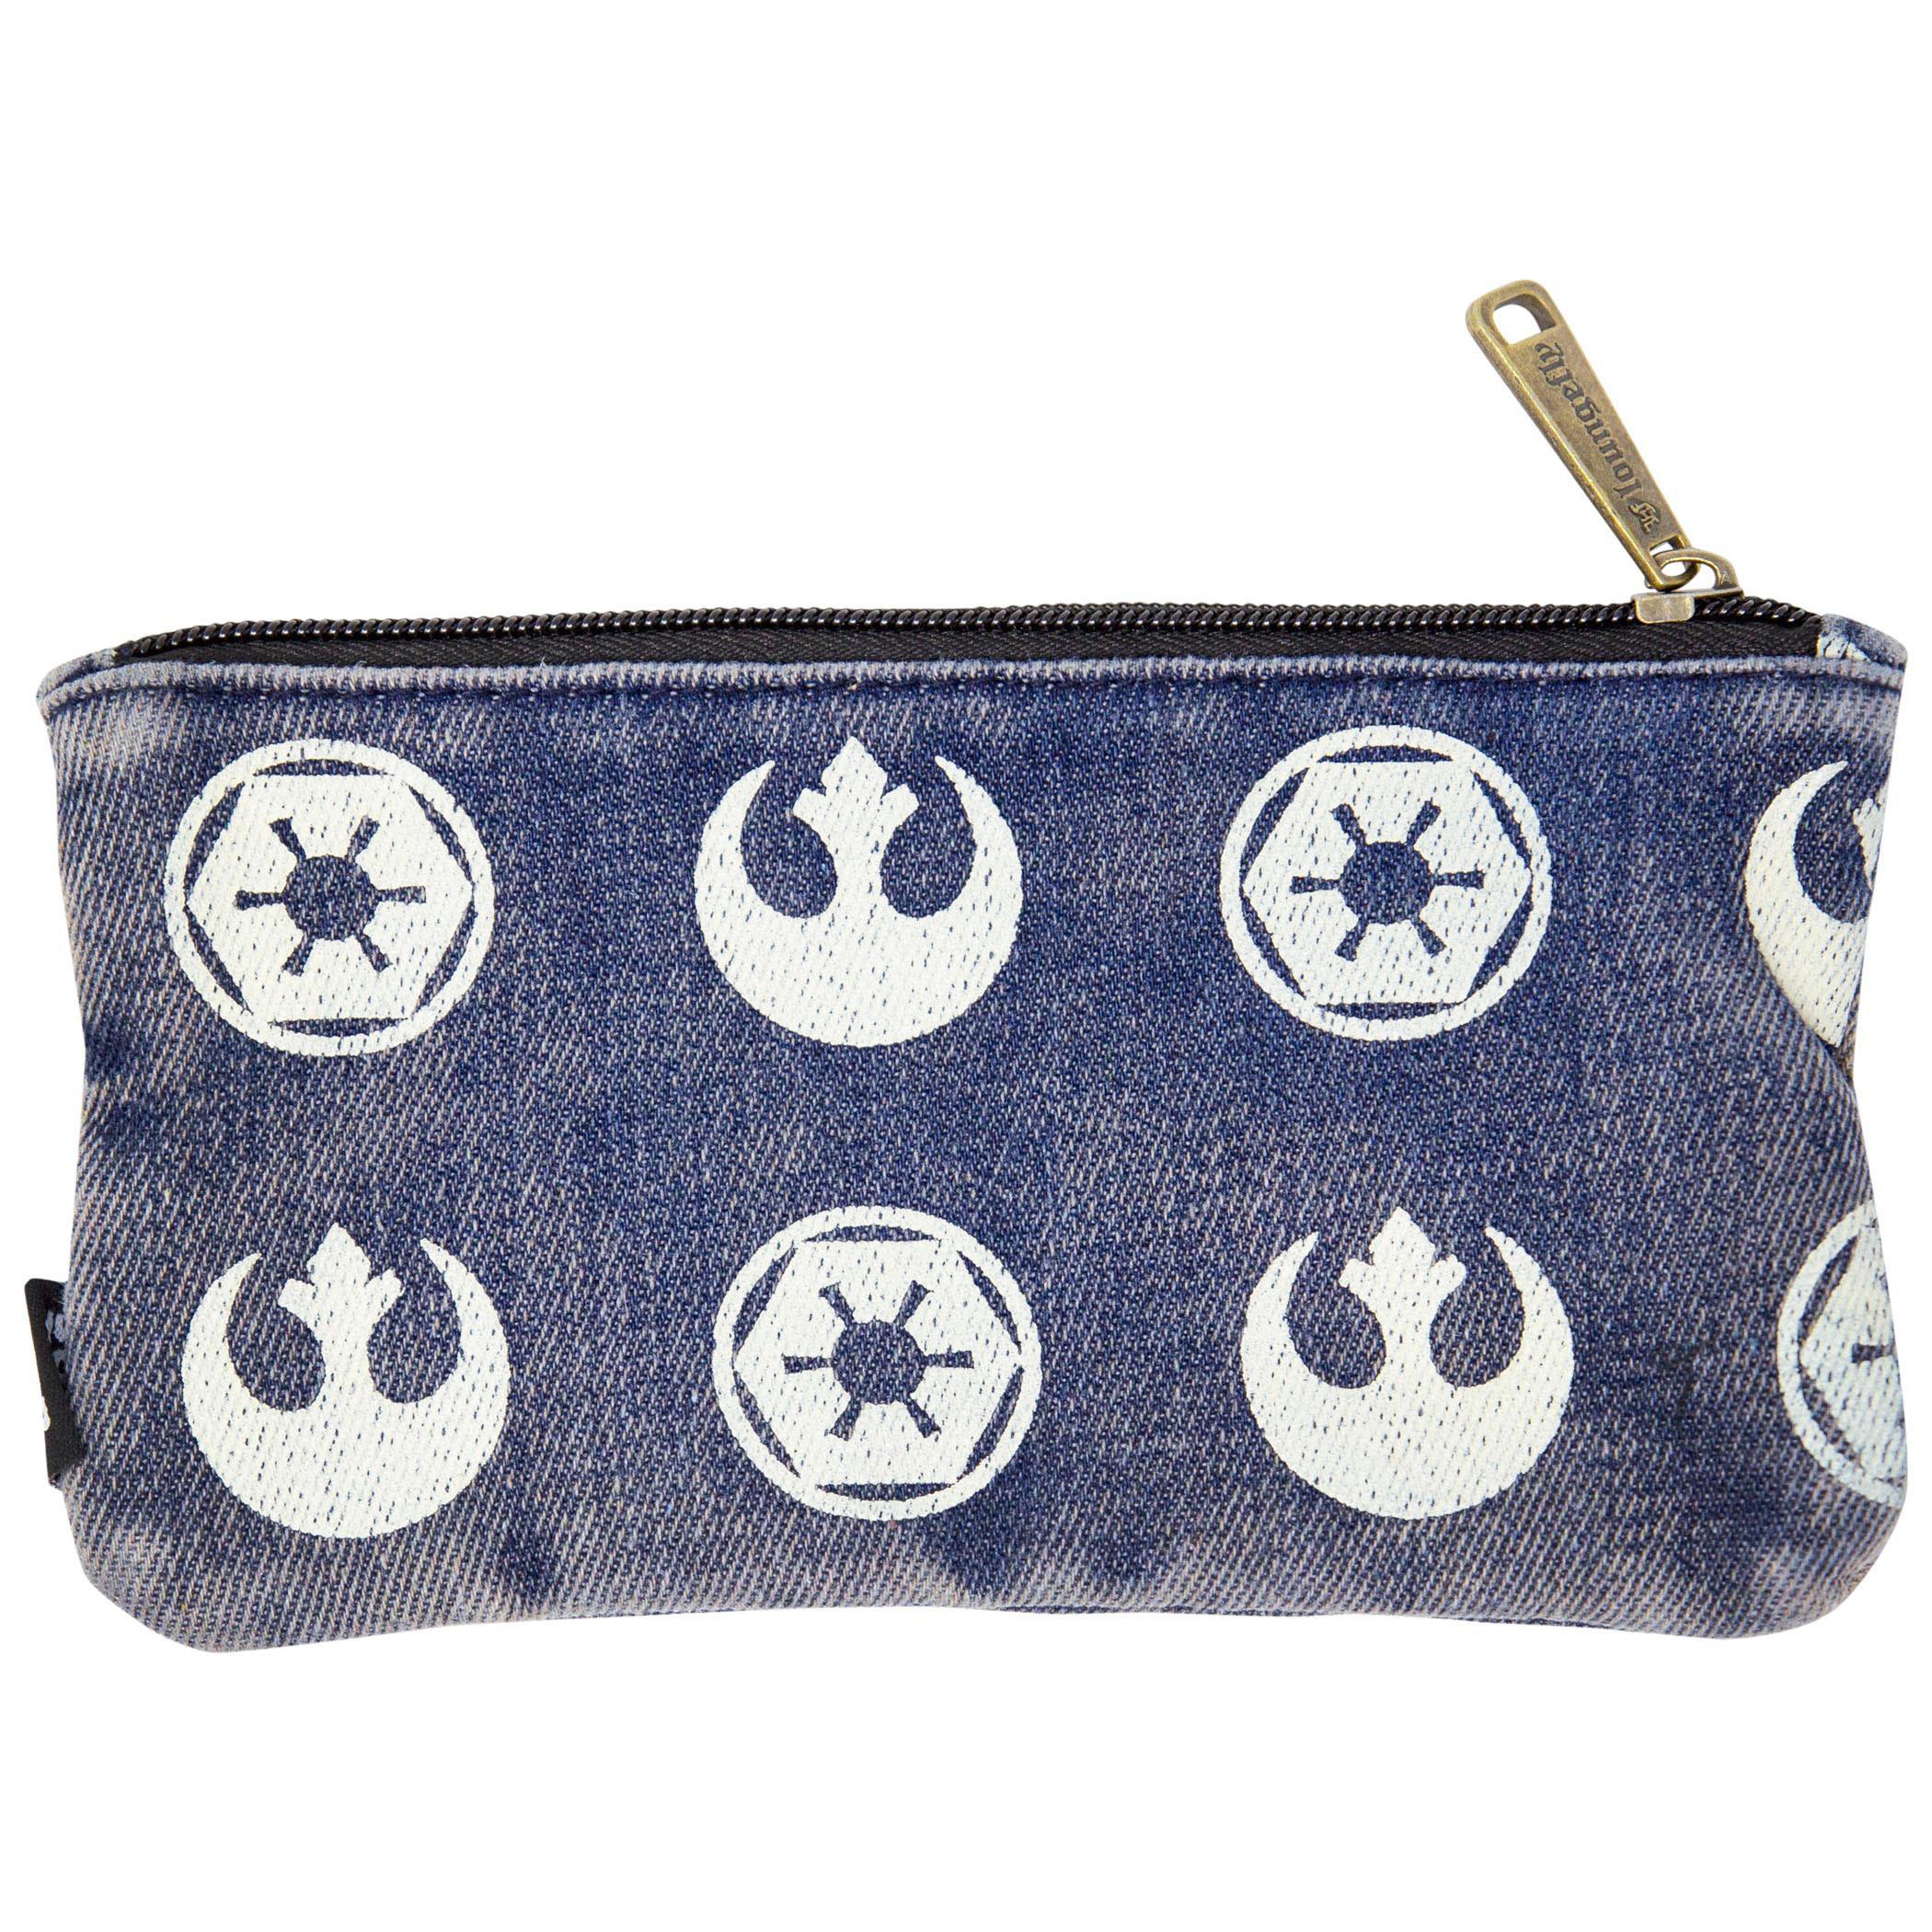 Star Wars Logos Mini Clutch Purse